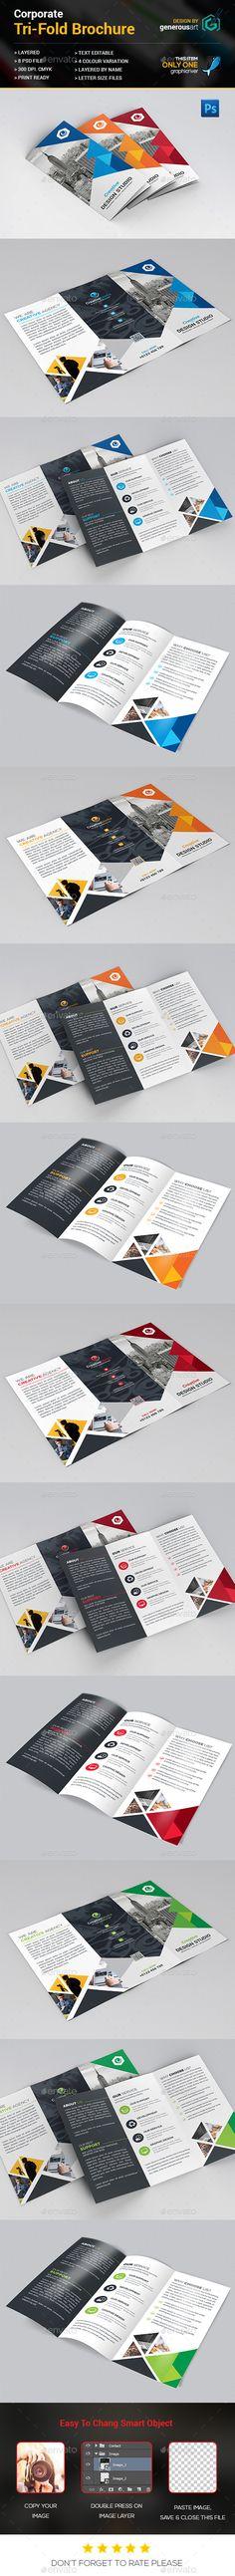 Modern Tri-Fold Brochure Template PSD. Download here: http://graphicriver.net/item/modern-trifold-brochure/15076382?ref=ksioks